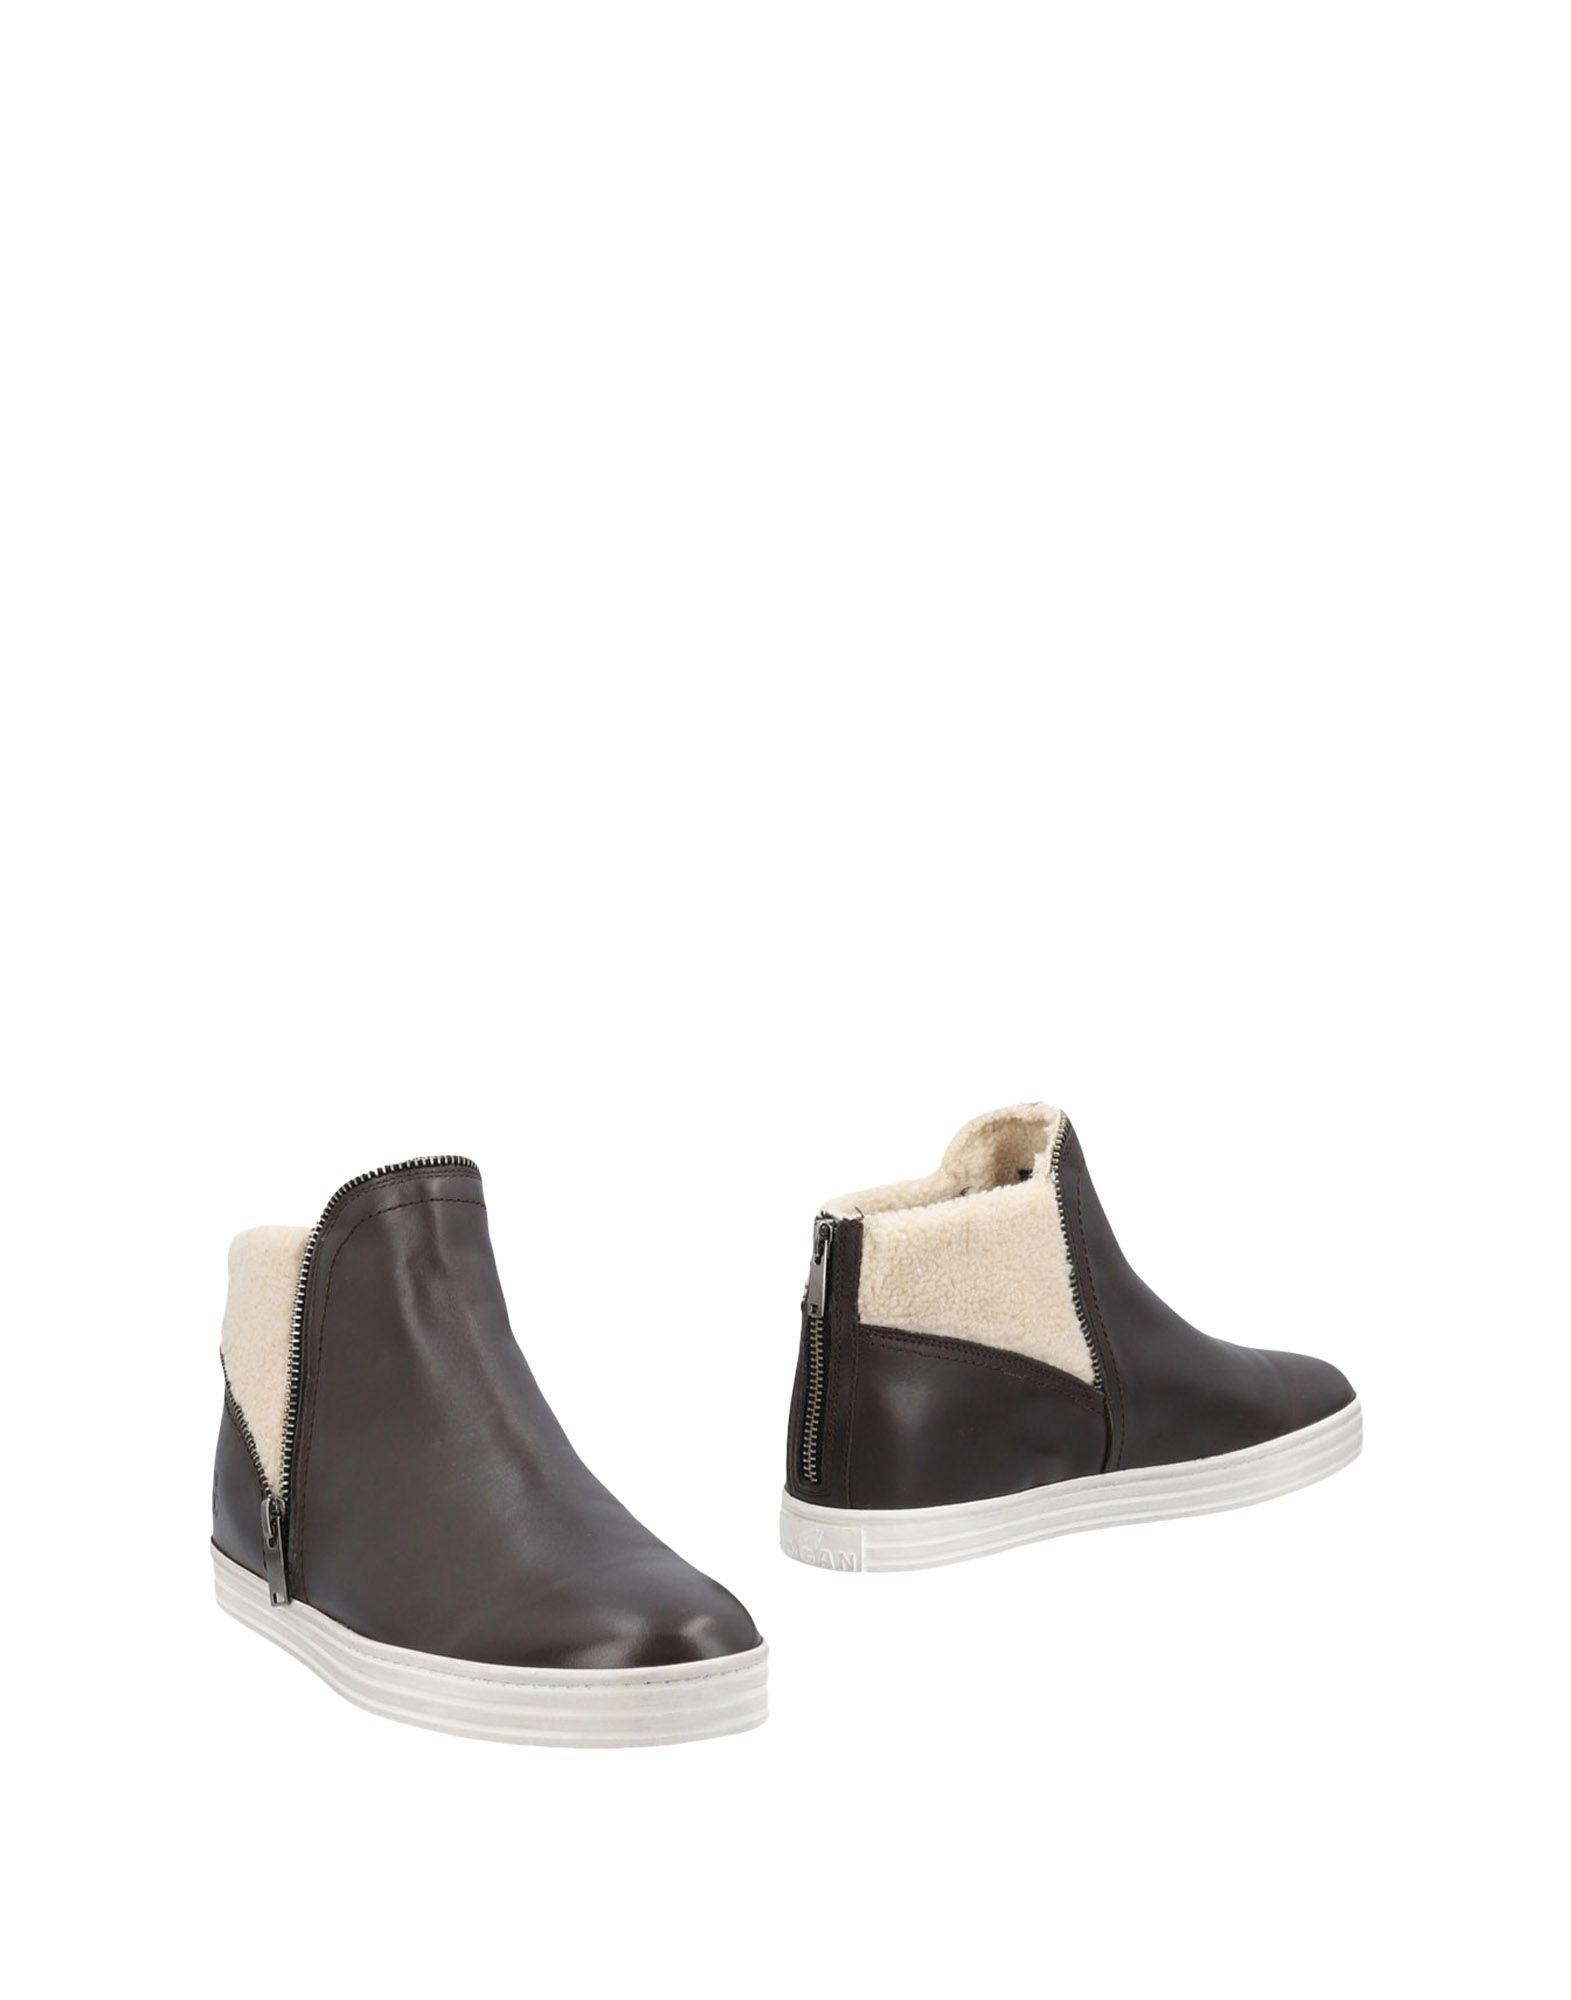 Stilvolle billige Schuhe Hogan Rebel Stiefelette Damen Schuhe 11483548SJ  f22247 f474eb4508